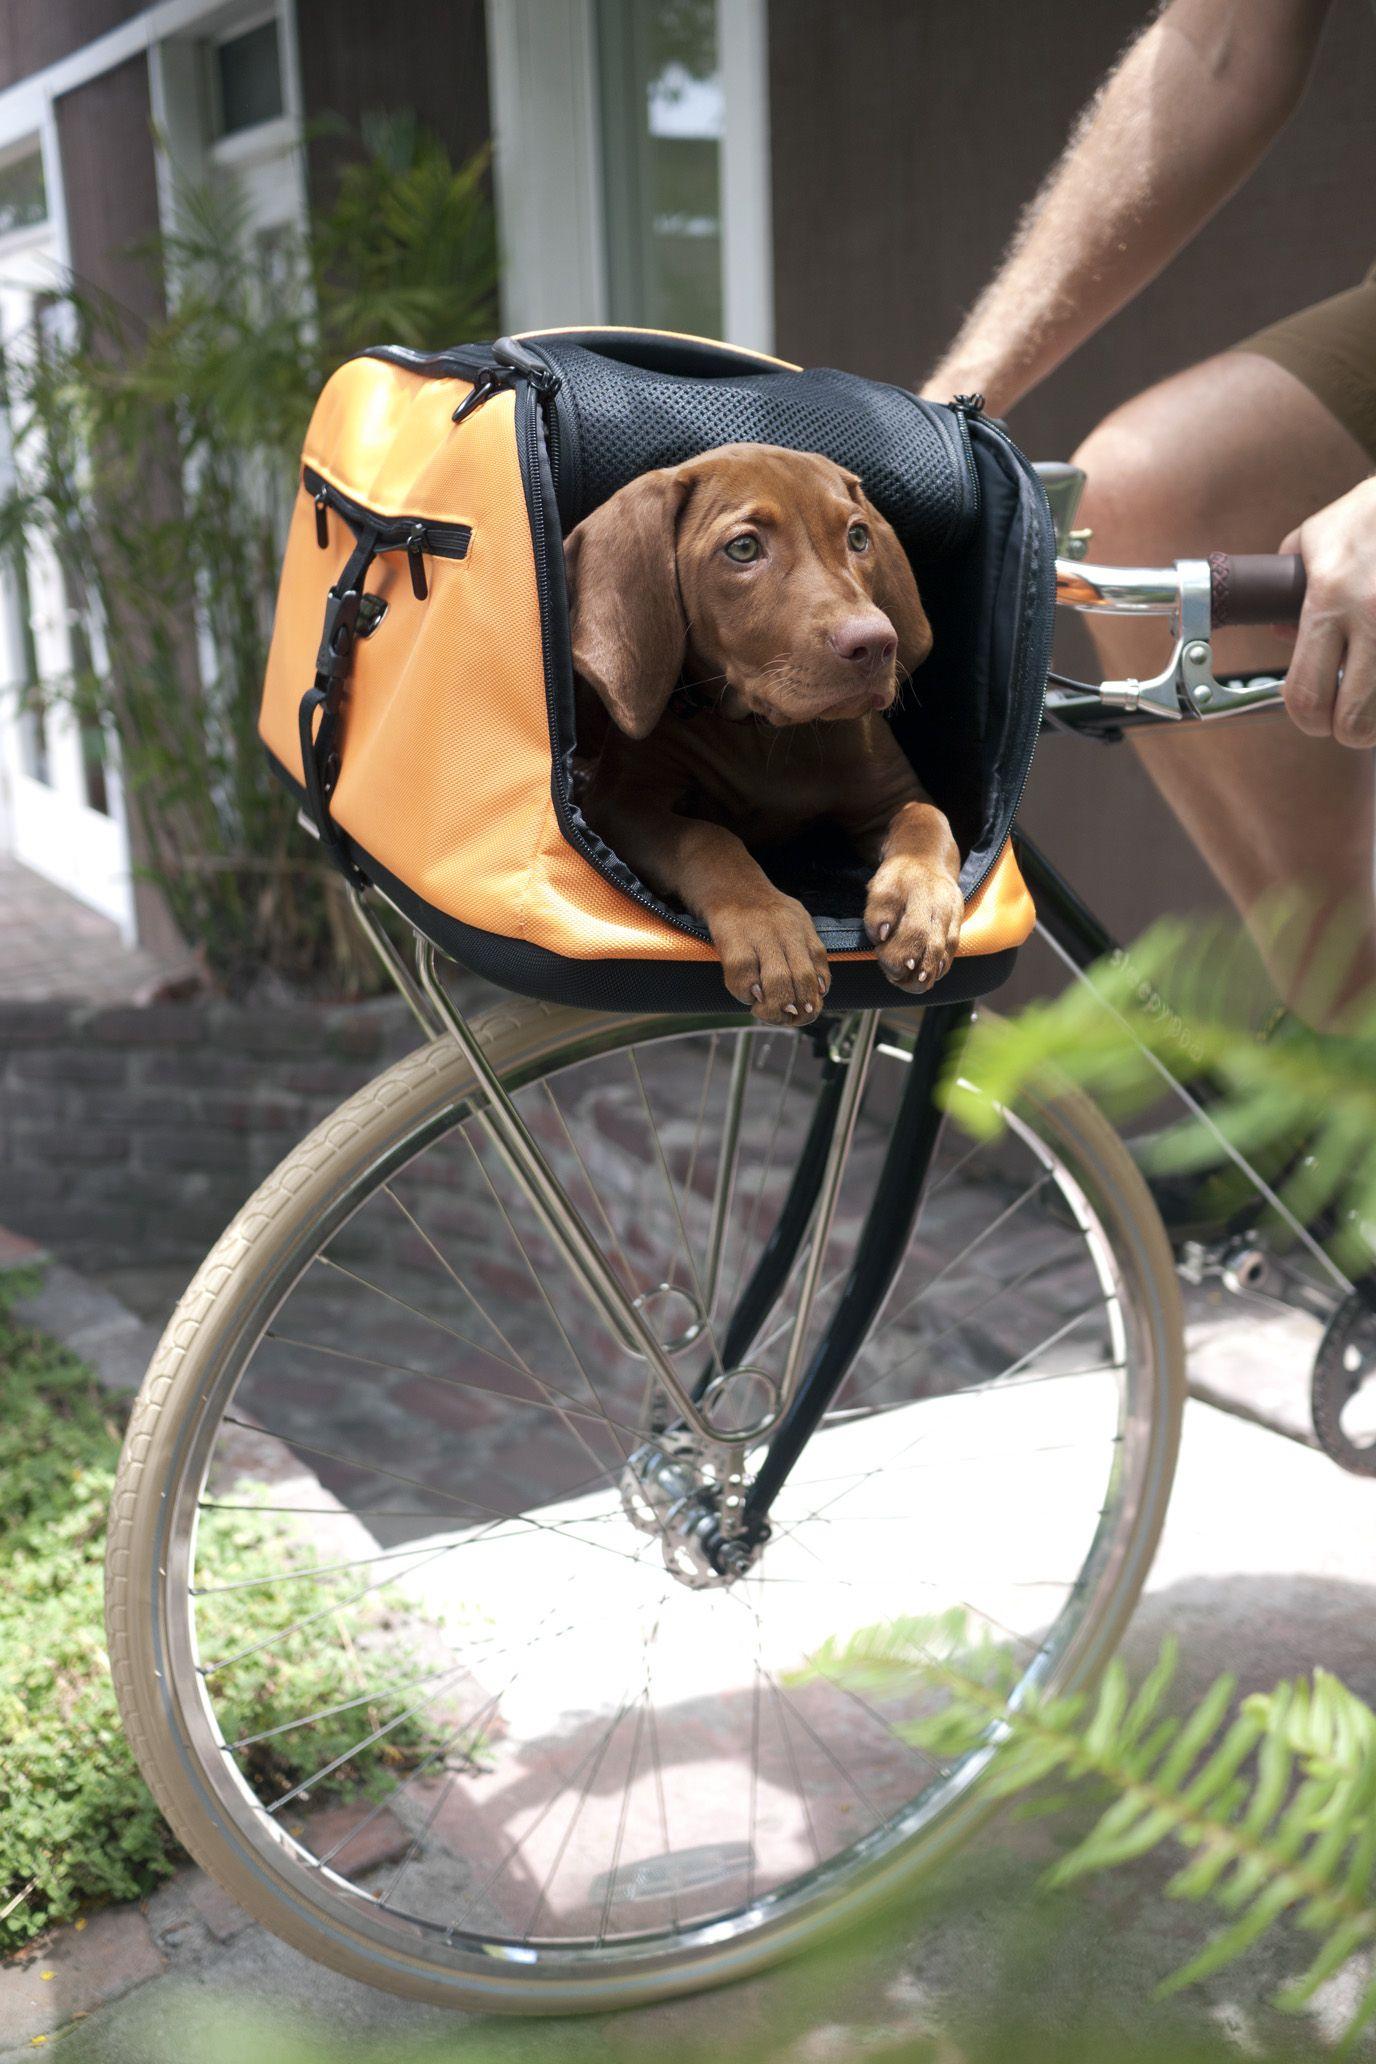 5bd45cf97b048da9c7d411e859ba3cc0 sleepypod sleepypod® orange dream pinterest bike, pet